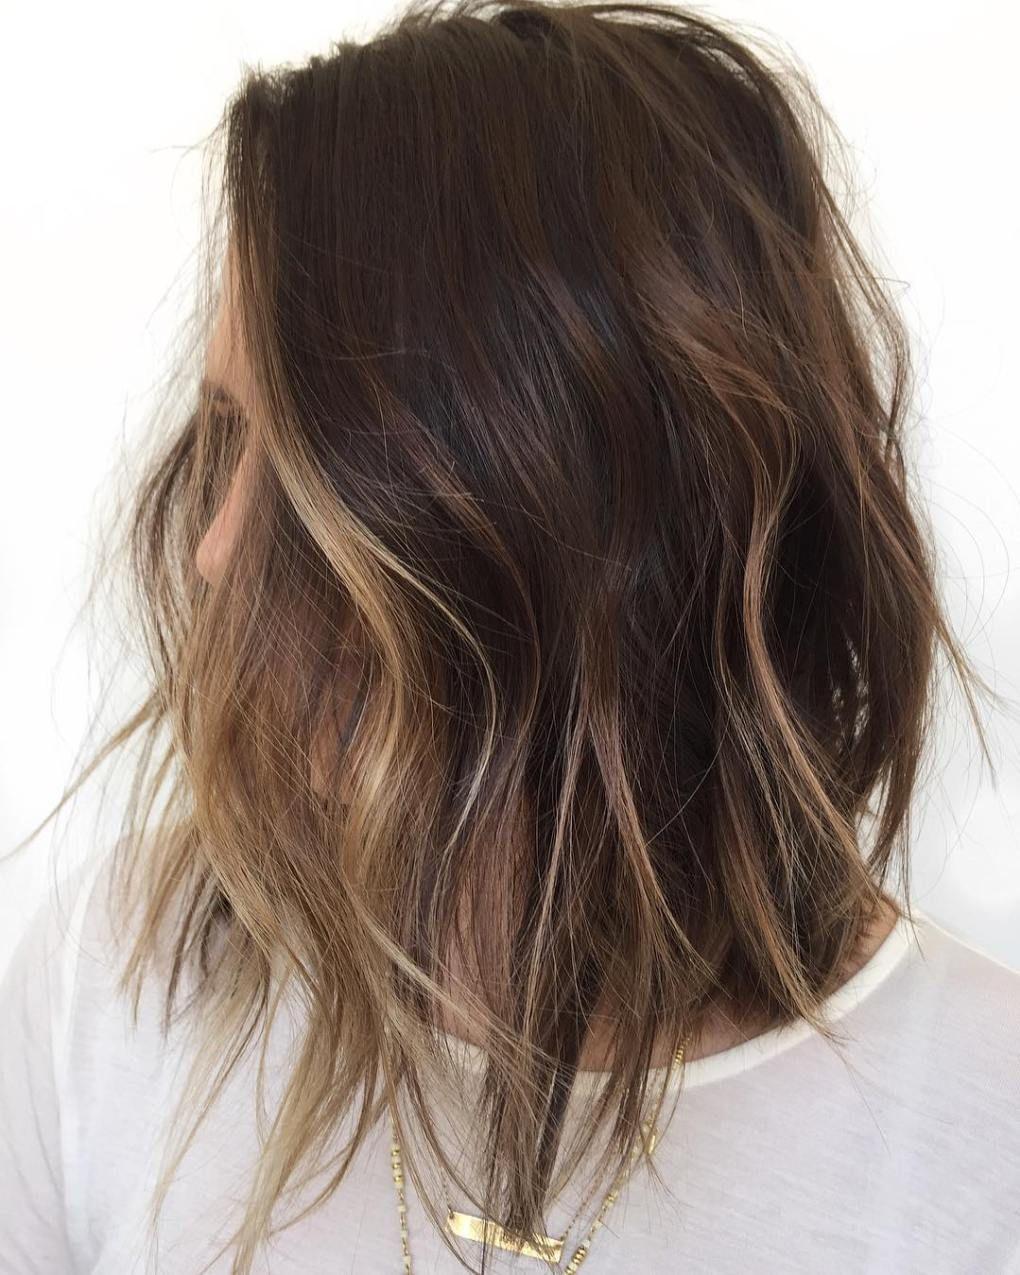 Brunette Bob With Face Framing Balayage Hair Color Balayage Balayage Hair Hair Styles